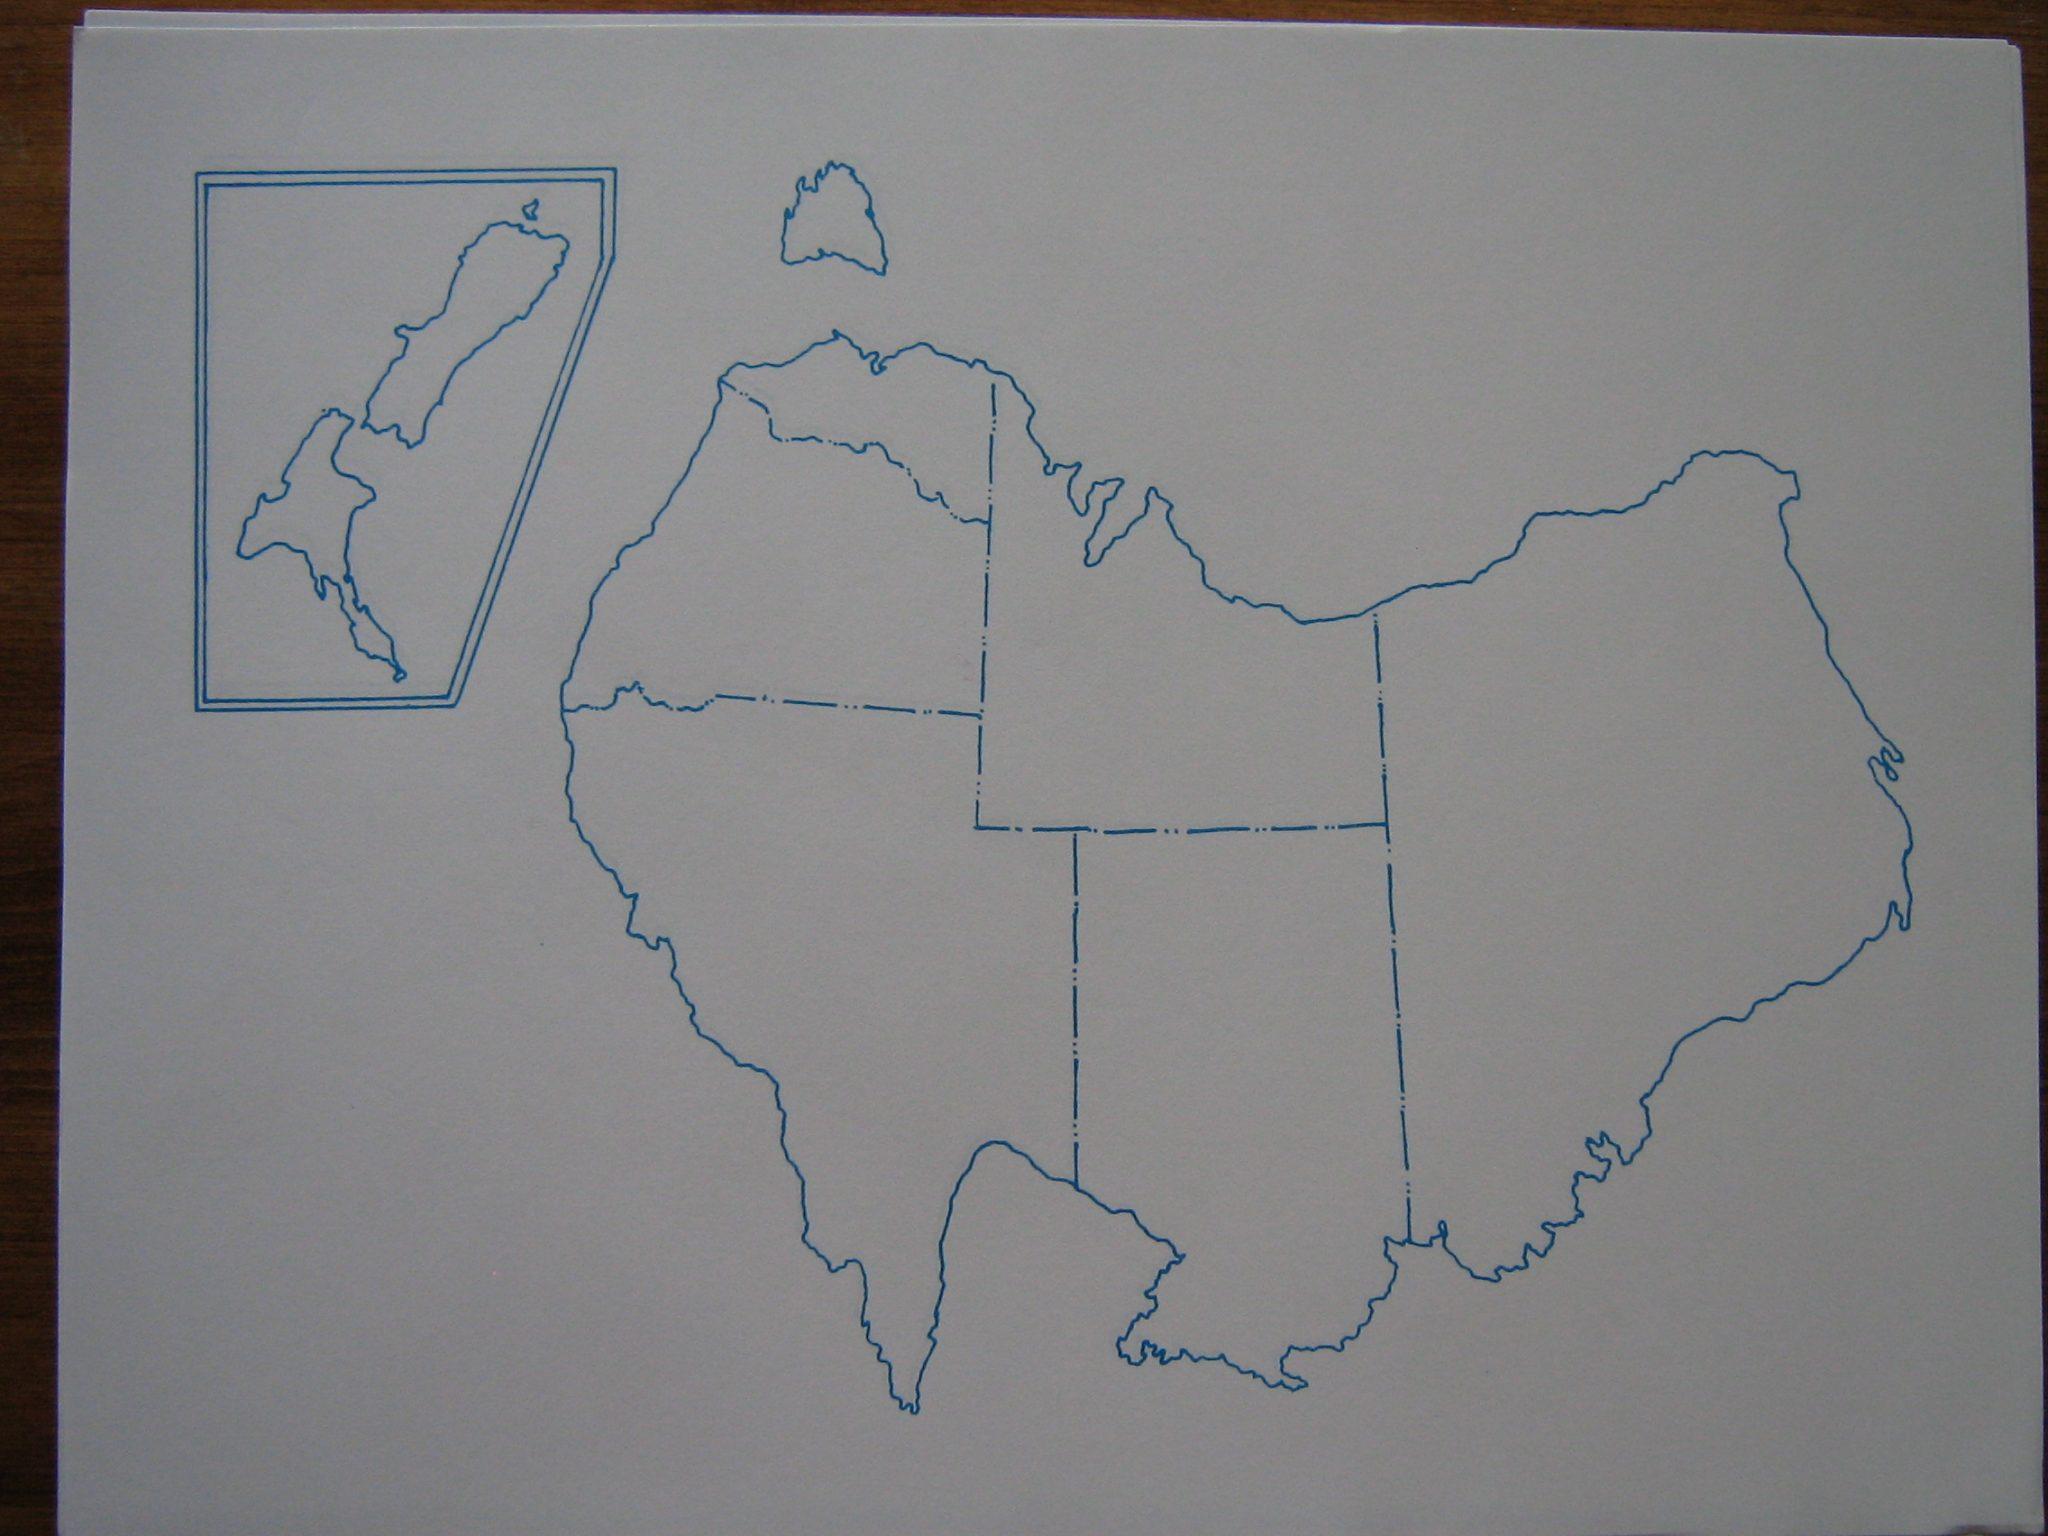 Map Of Australia Unlabelled.Mau Australia Letter Size Map 250 Sheets Pkg